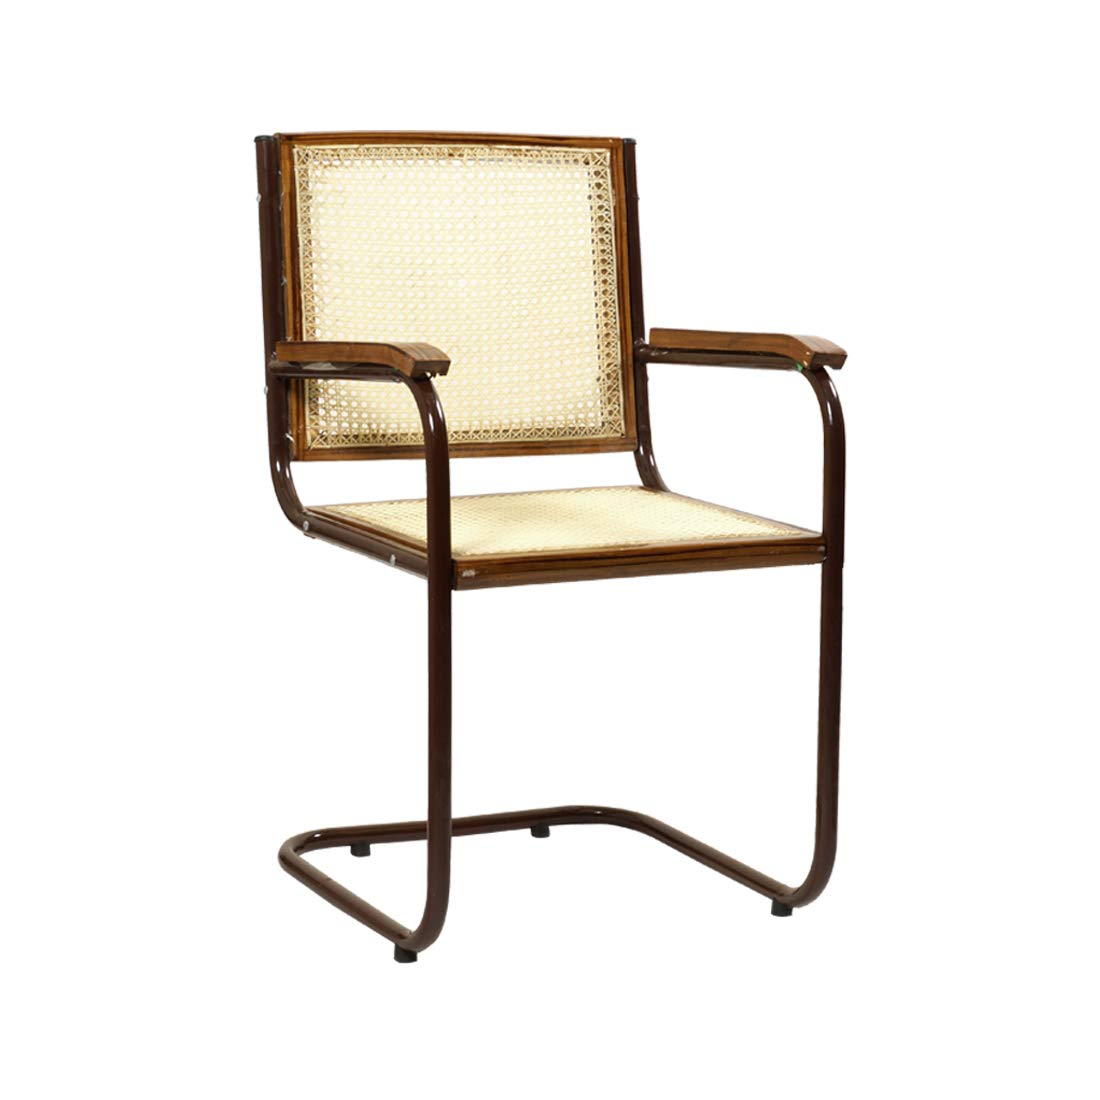 Venkat Sulochana Furniture DSF S Type Chair: Amazon.in: Home